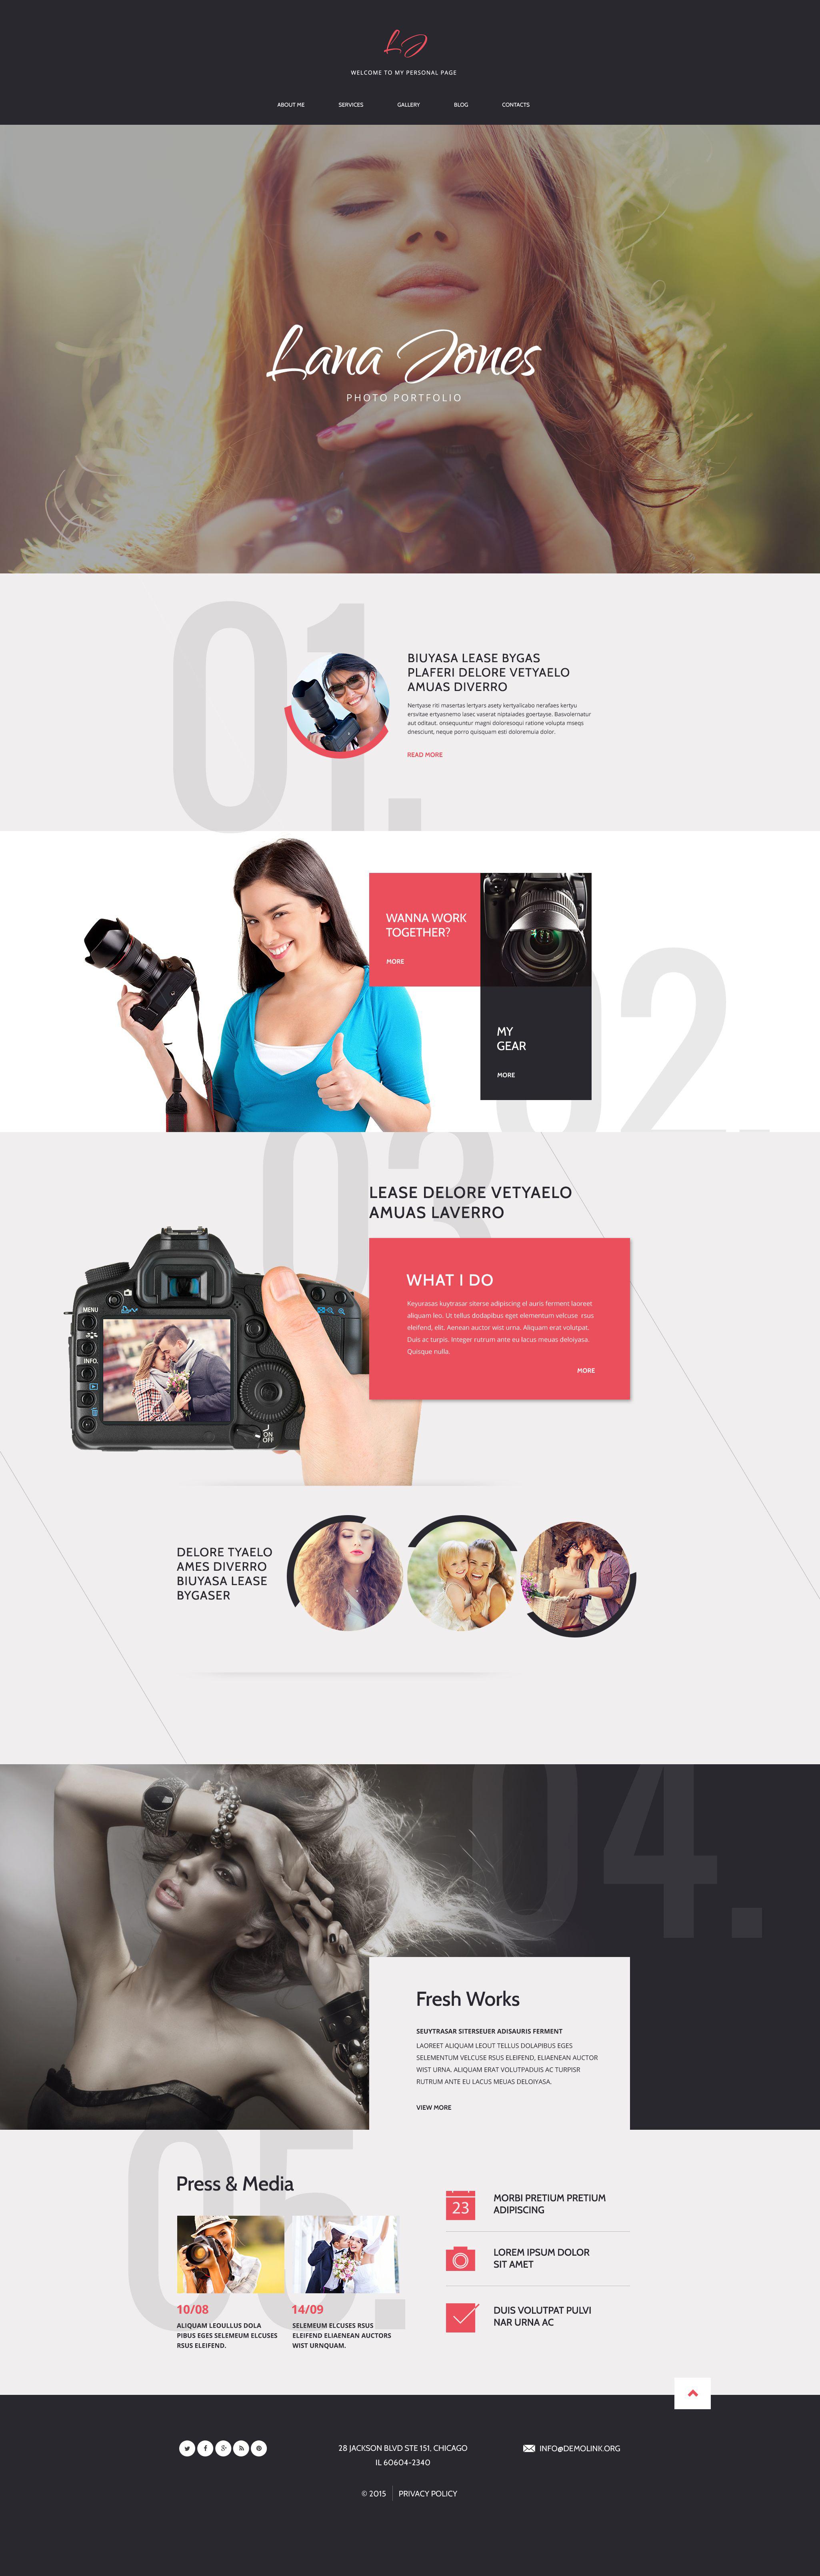 Plantilla Drupal Responsive para Sitio de Portafolios de fotógrafos #54832